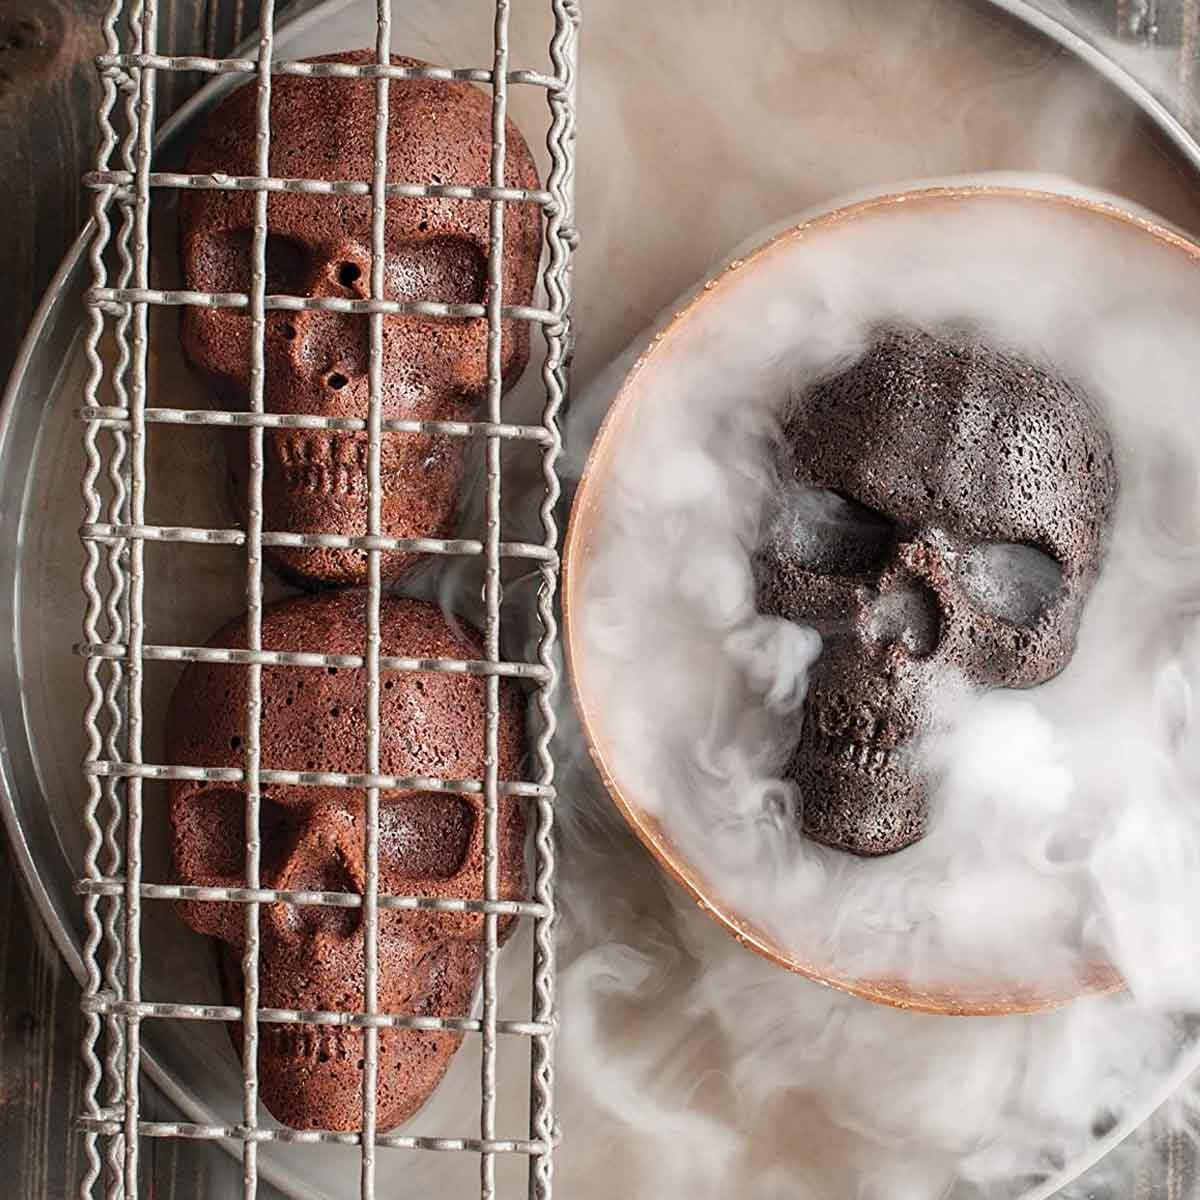 Haunted Skull Cakelet Pan in Dry Ice